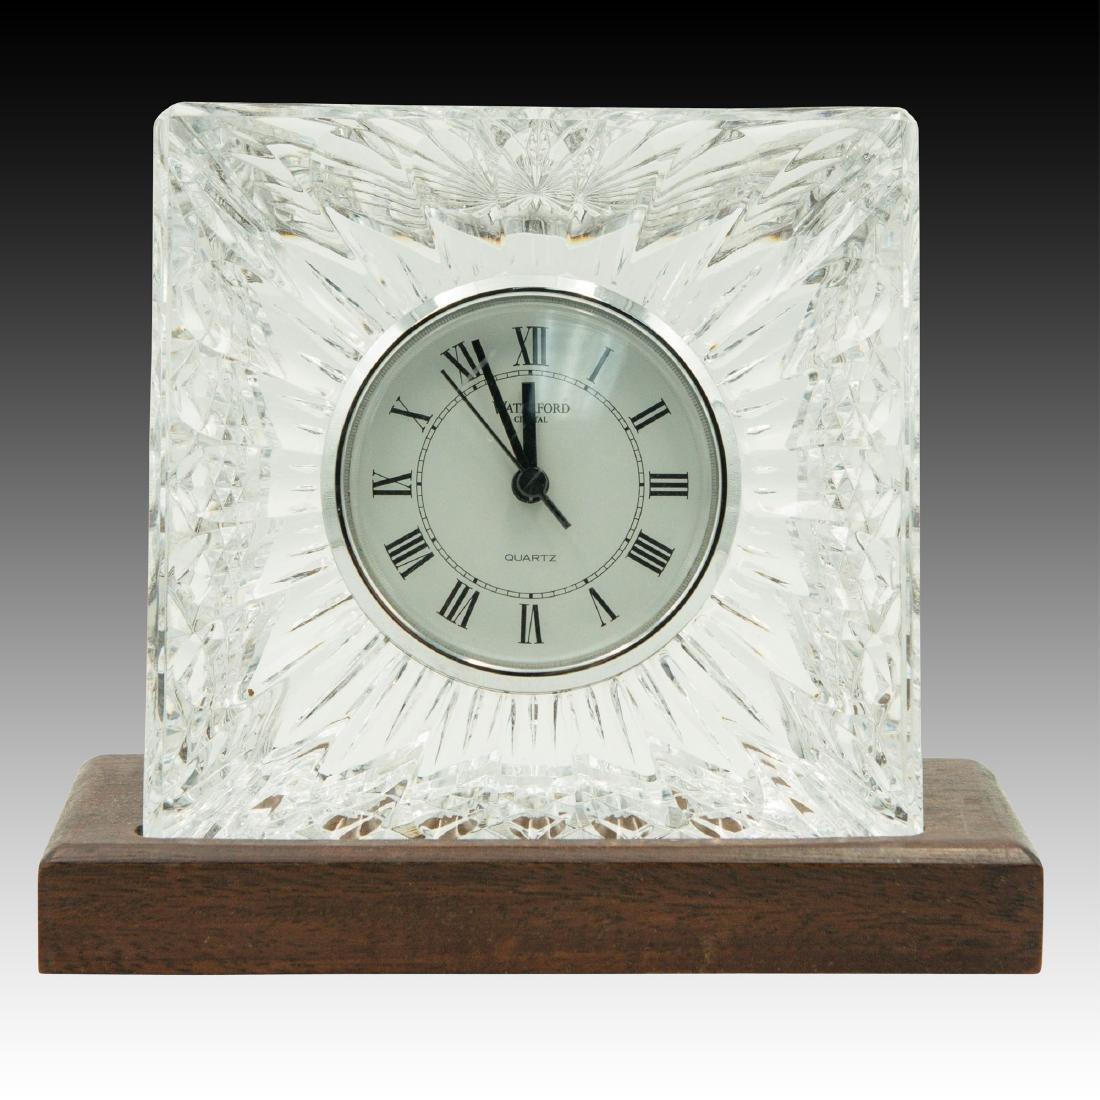 8PC WATERFORD LISMORE GLASSES, CLOCK, PEN HOLDER - 2